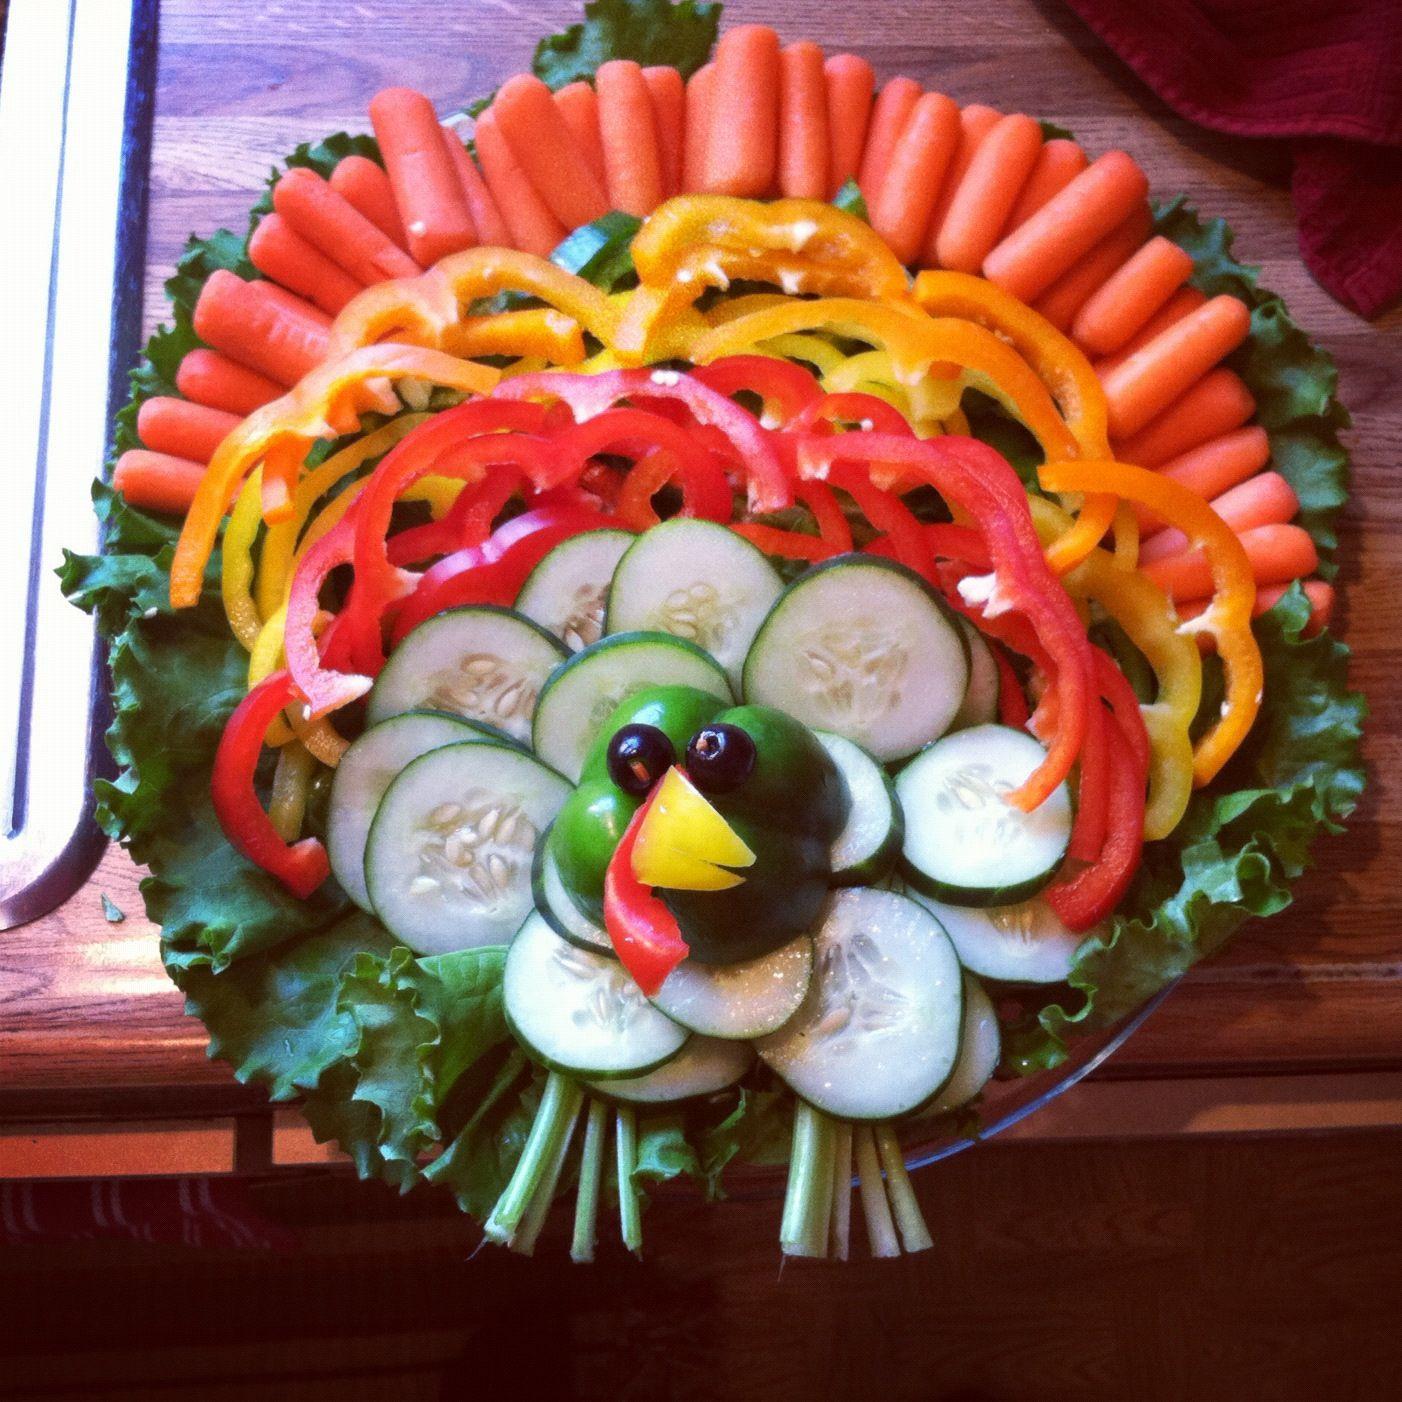 Thanksgiving Turkey Veggie Tray  1000 ideas about Turkey Veggie Platter on Pinterest